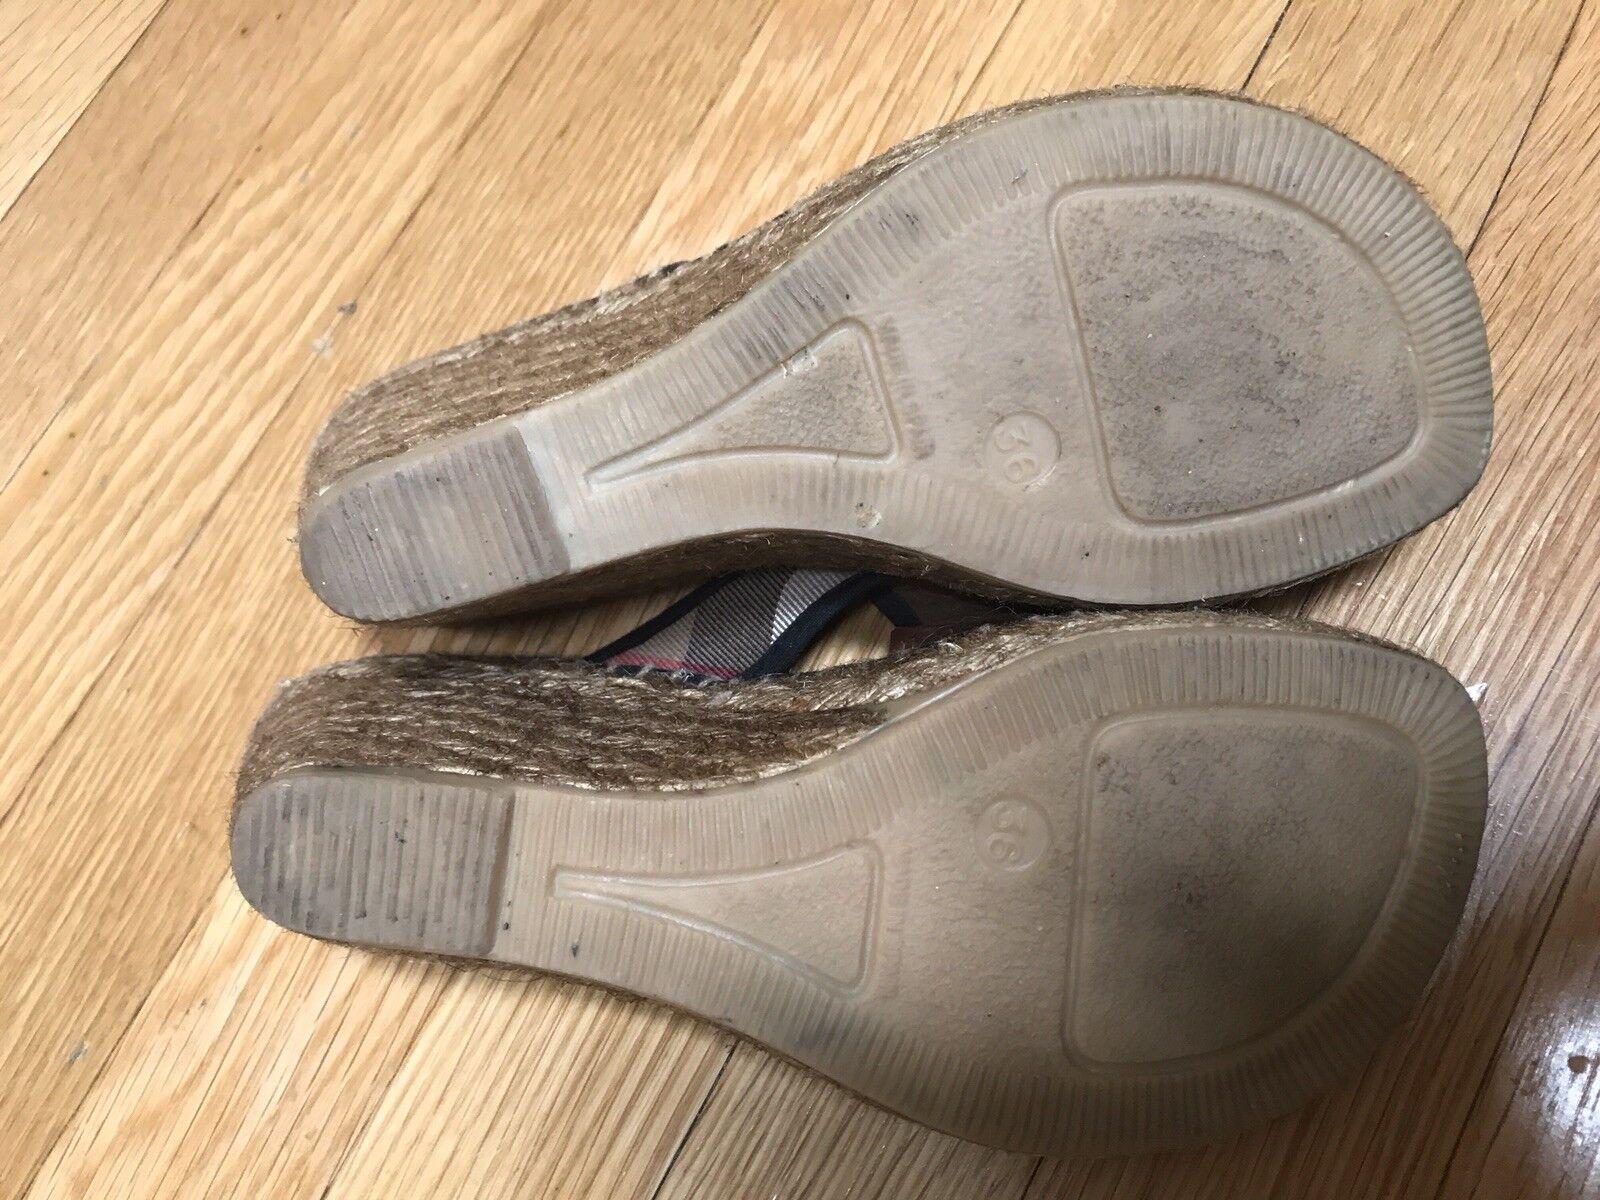 Genuine Burberry Women's Women's Women's Size 36 (6) Plaid Flip Flop Sandal Wedges Slightly Worn b08148